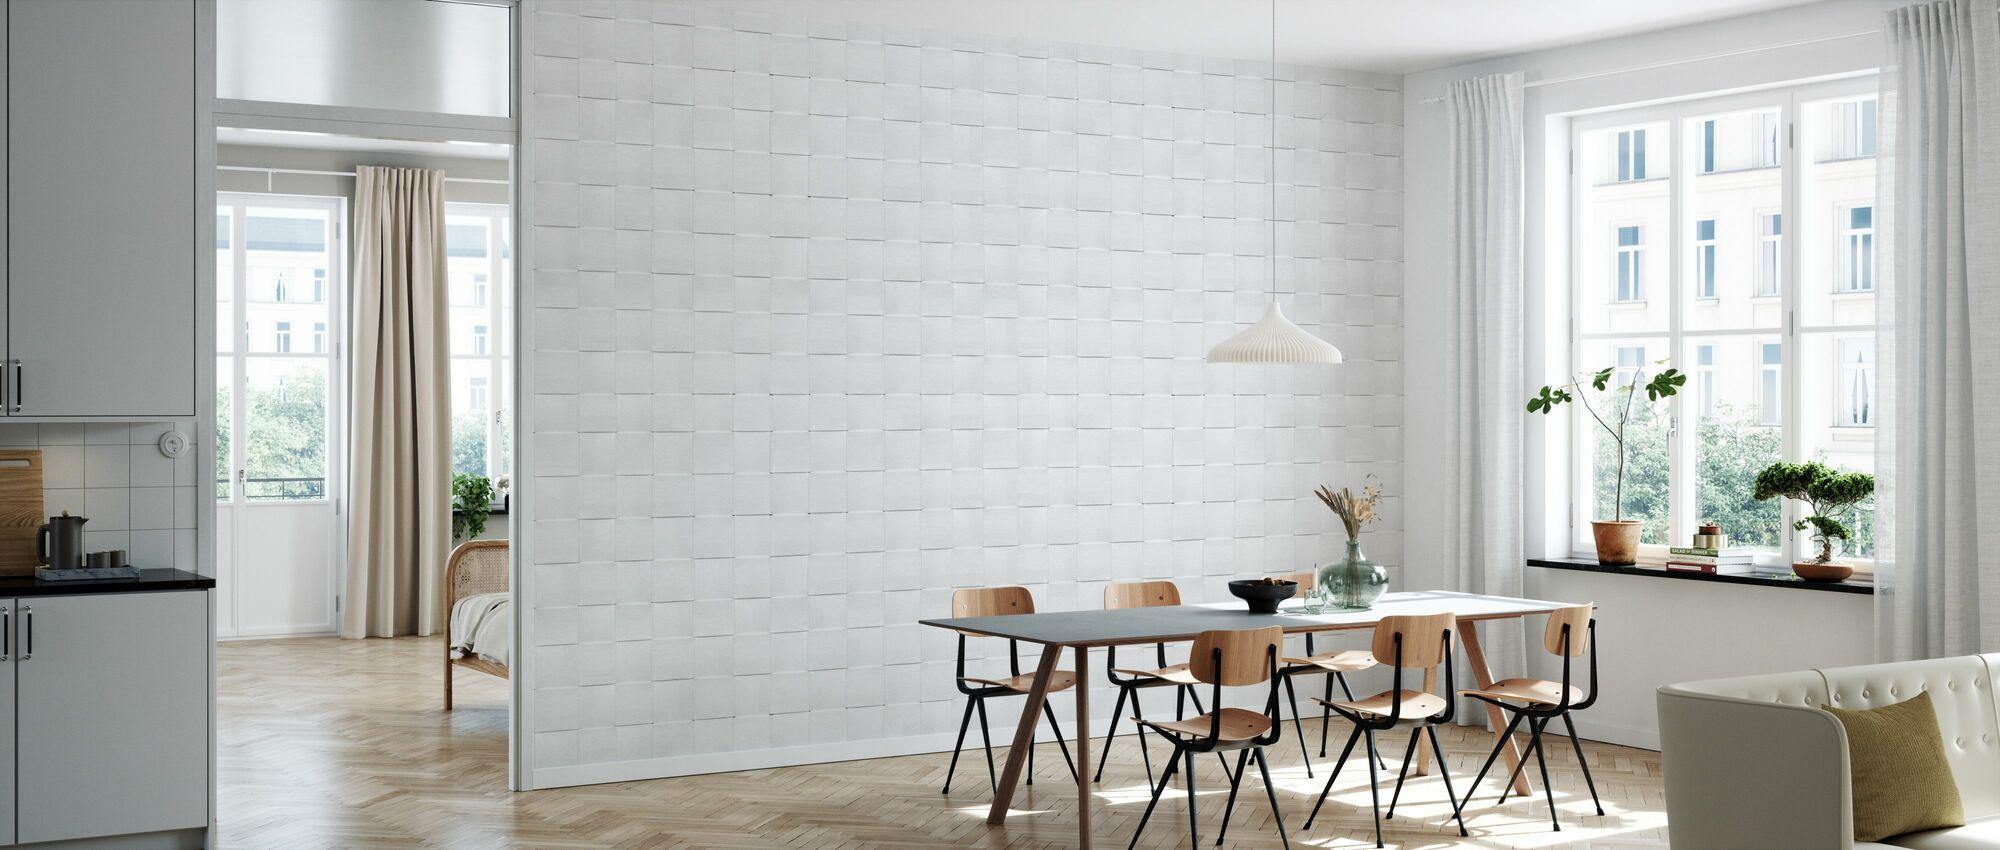 Paper Recycling - Wallpaper - Kitchen